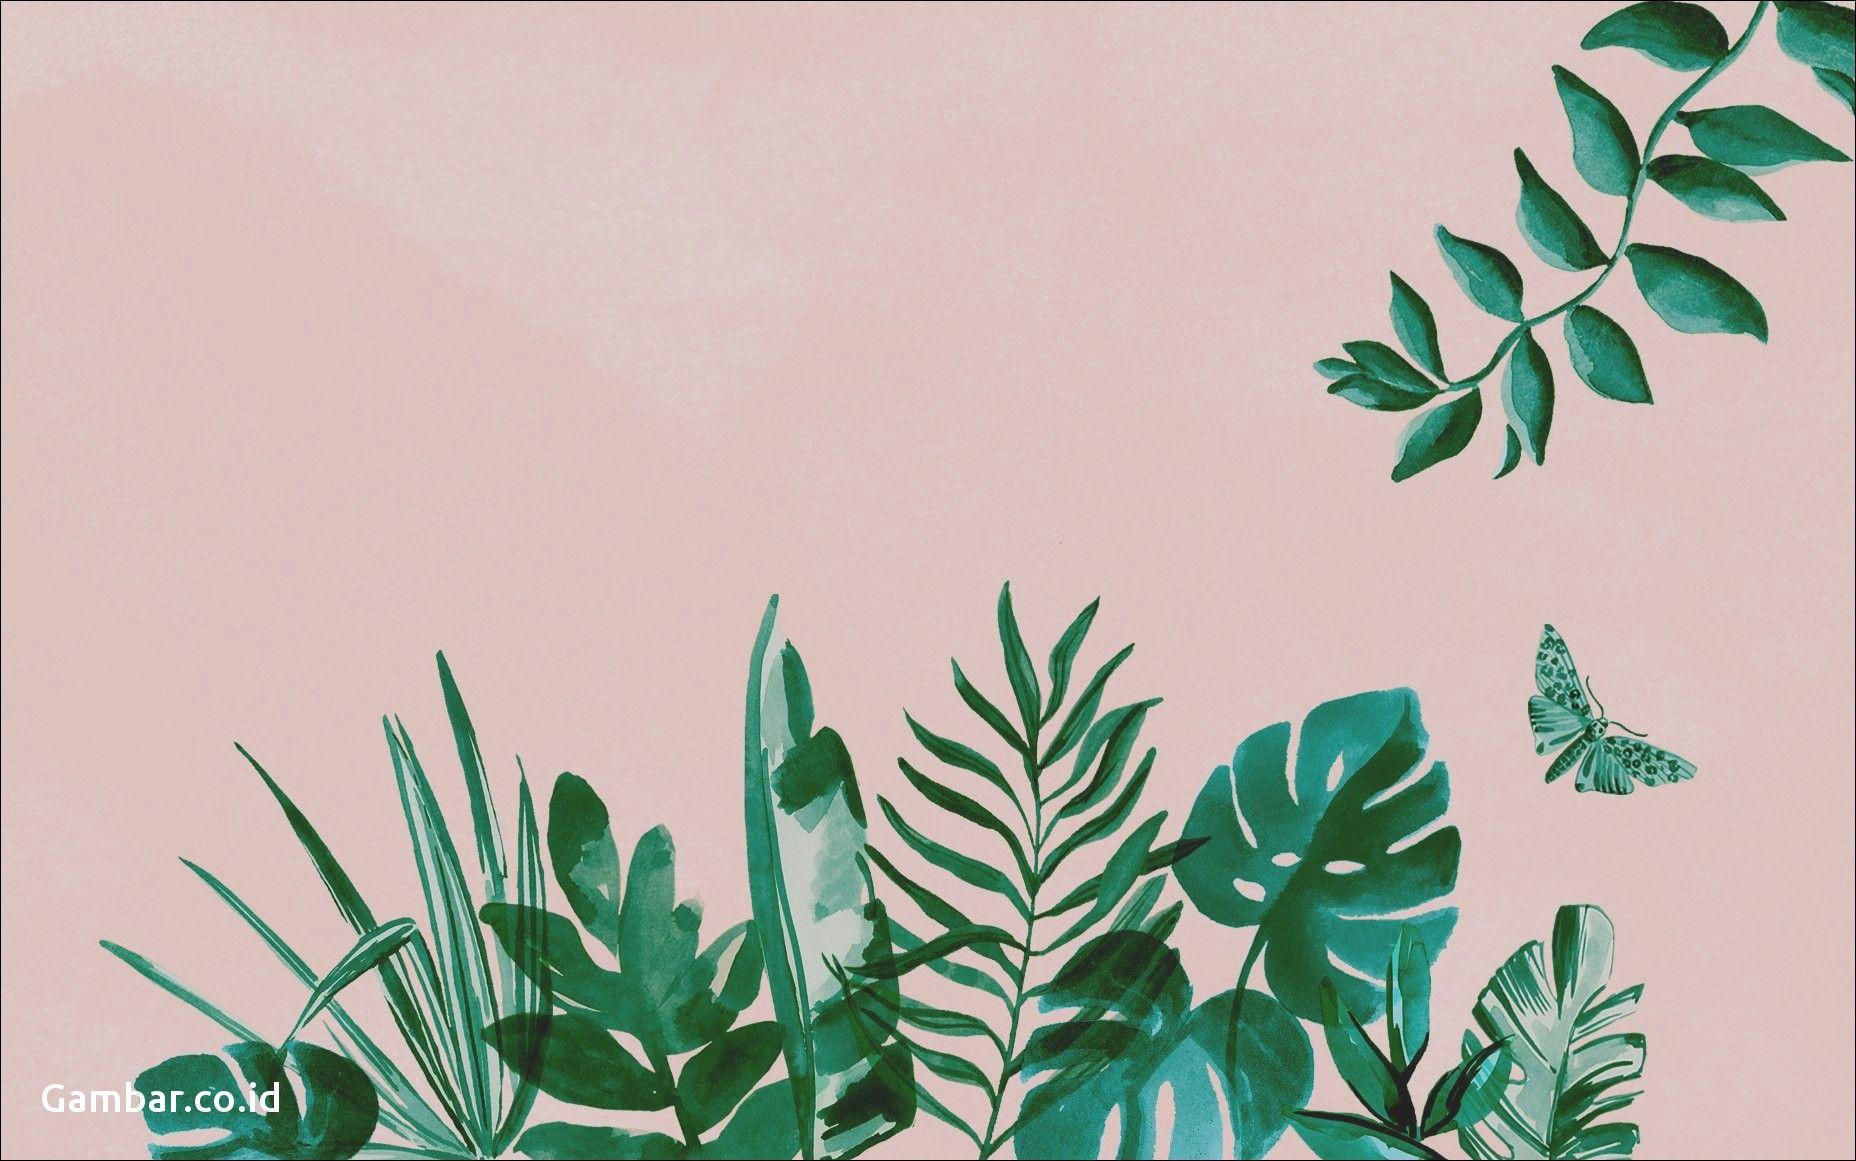 Download Tumblr Wallpaper For Laptop - Desktop Backgrounds Aesthetic - HD Wallpaper